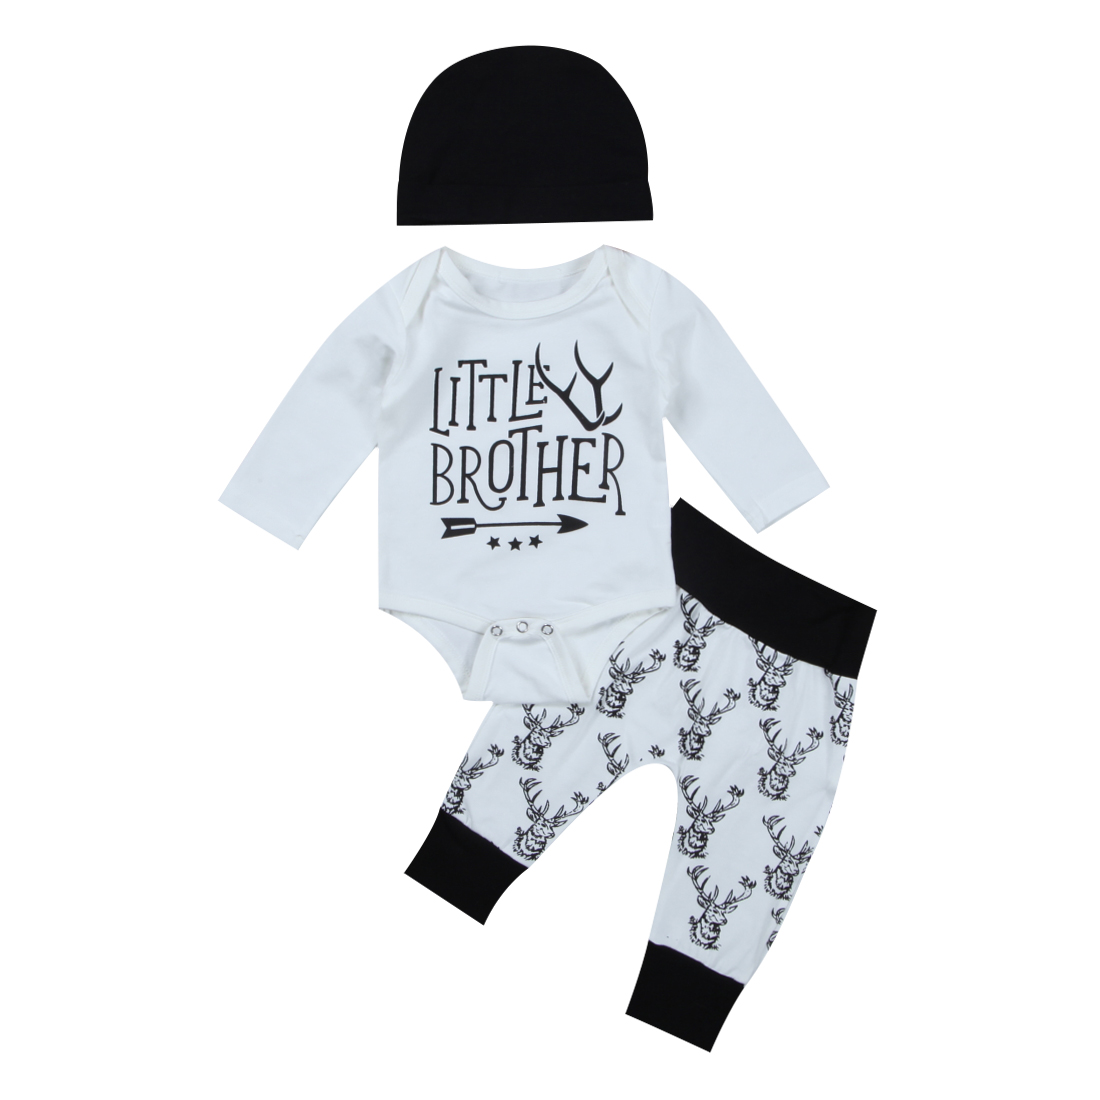 Pudcoco Newborn Baby Boys Deer Little Man Romper Christmas Deer Black Pants Leggings Outfits Set Clothes 3pcs 0-18M